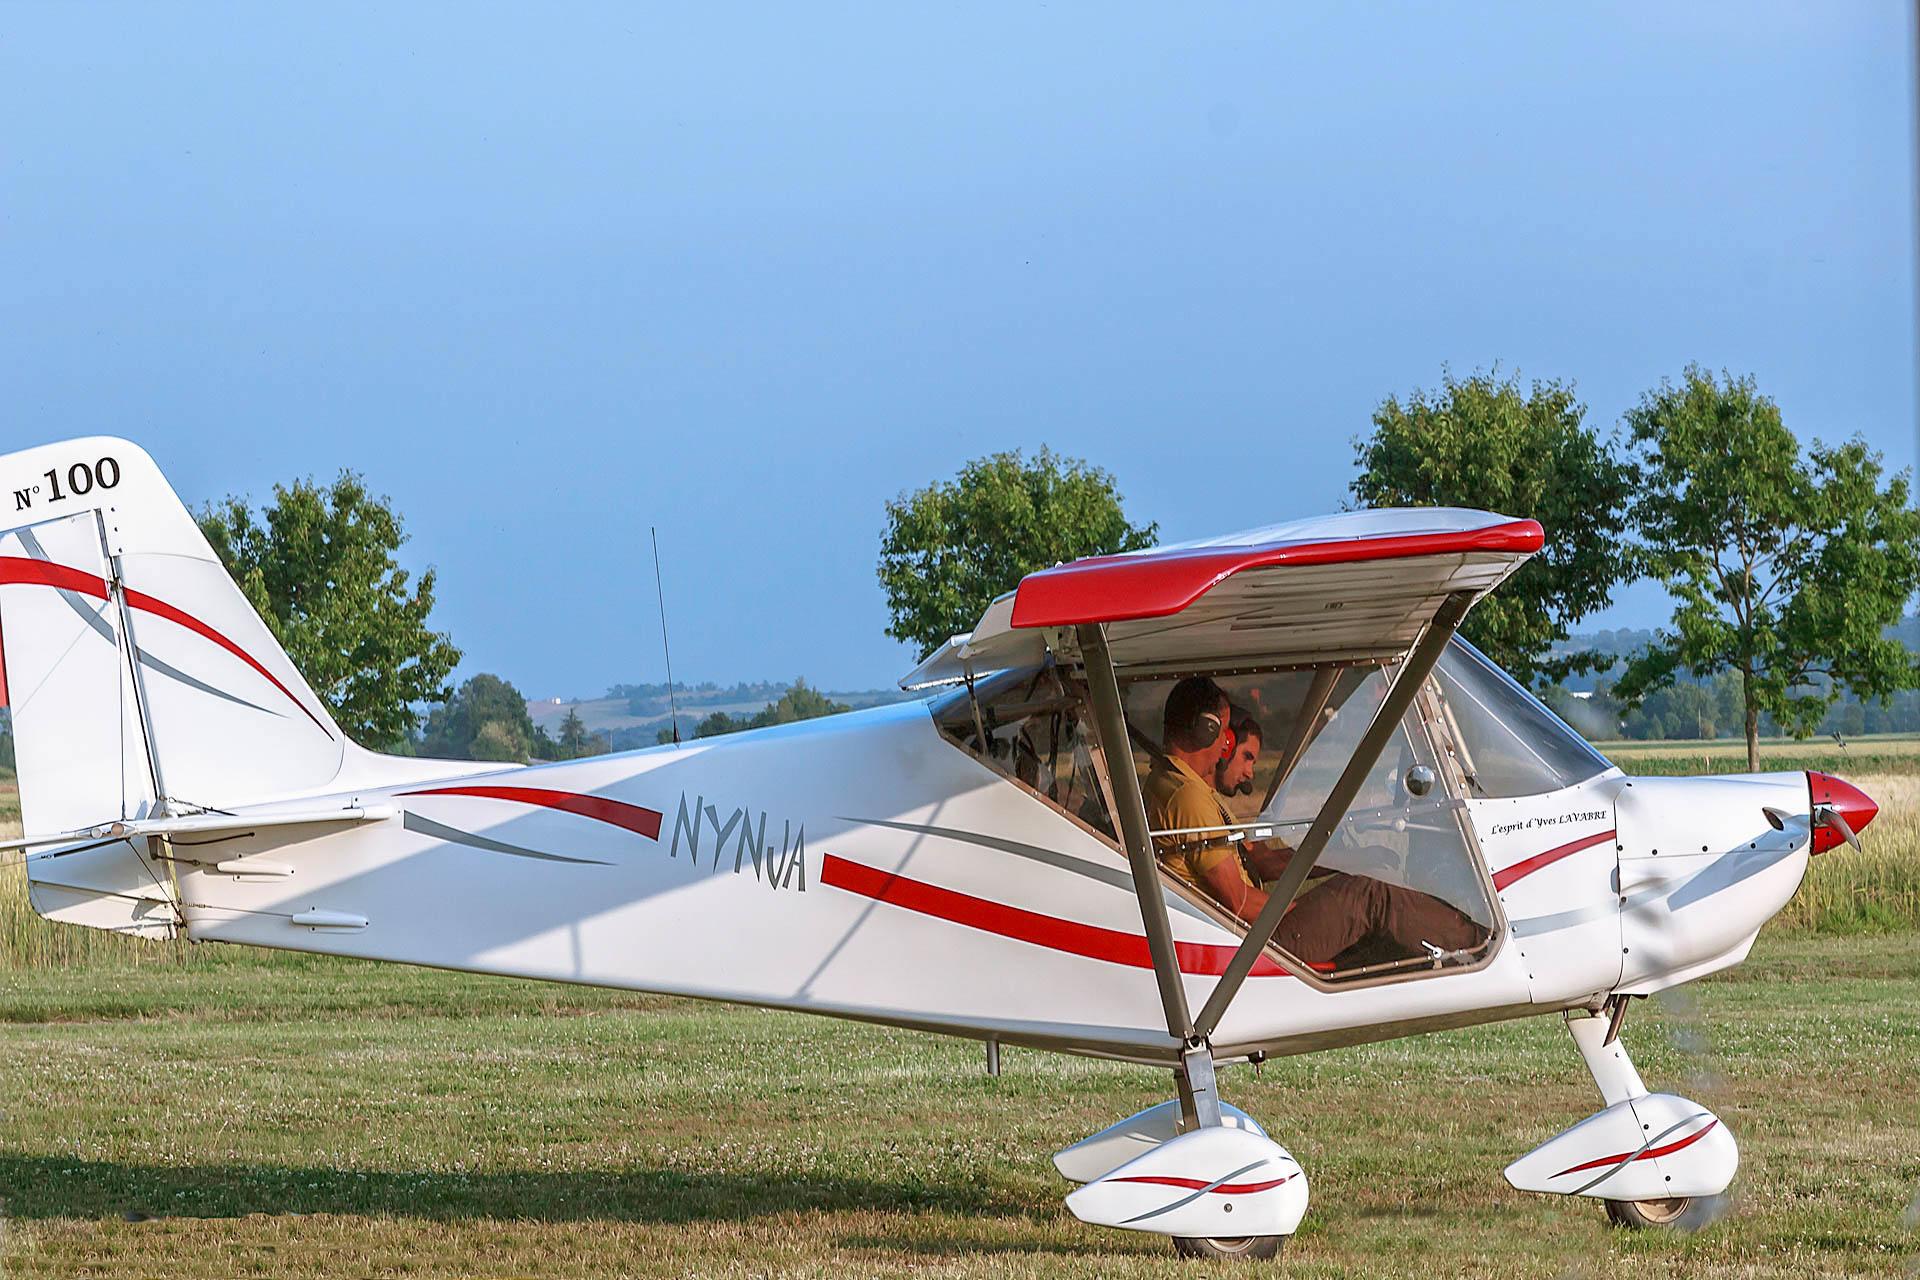 Aeronautique Ulm Nynja – Agnes Briand Photographe